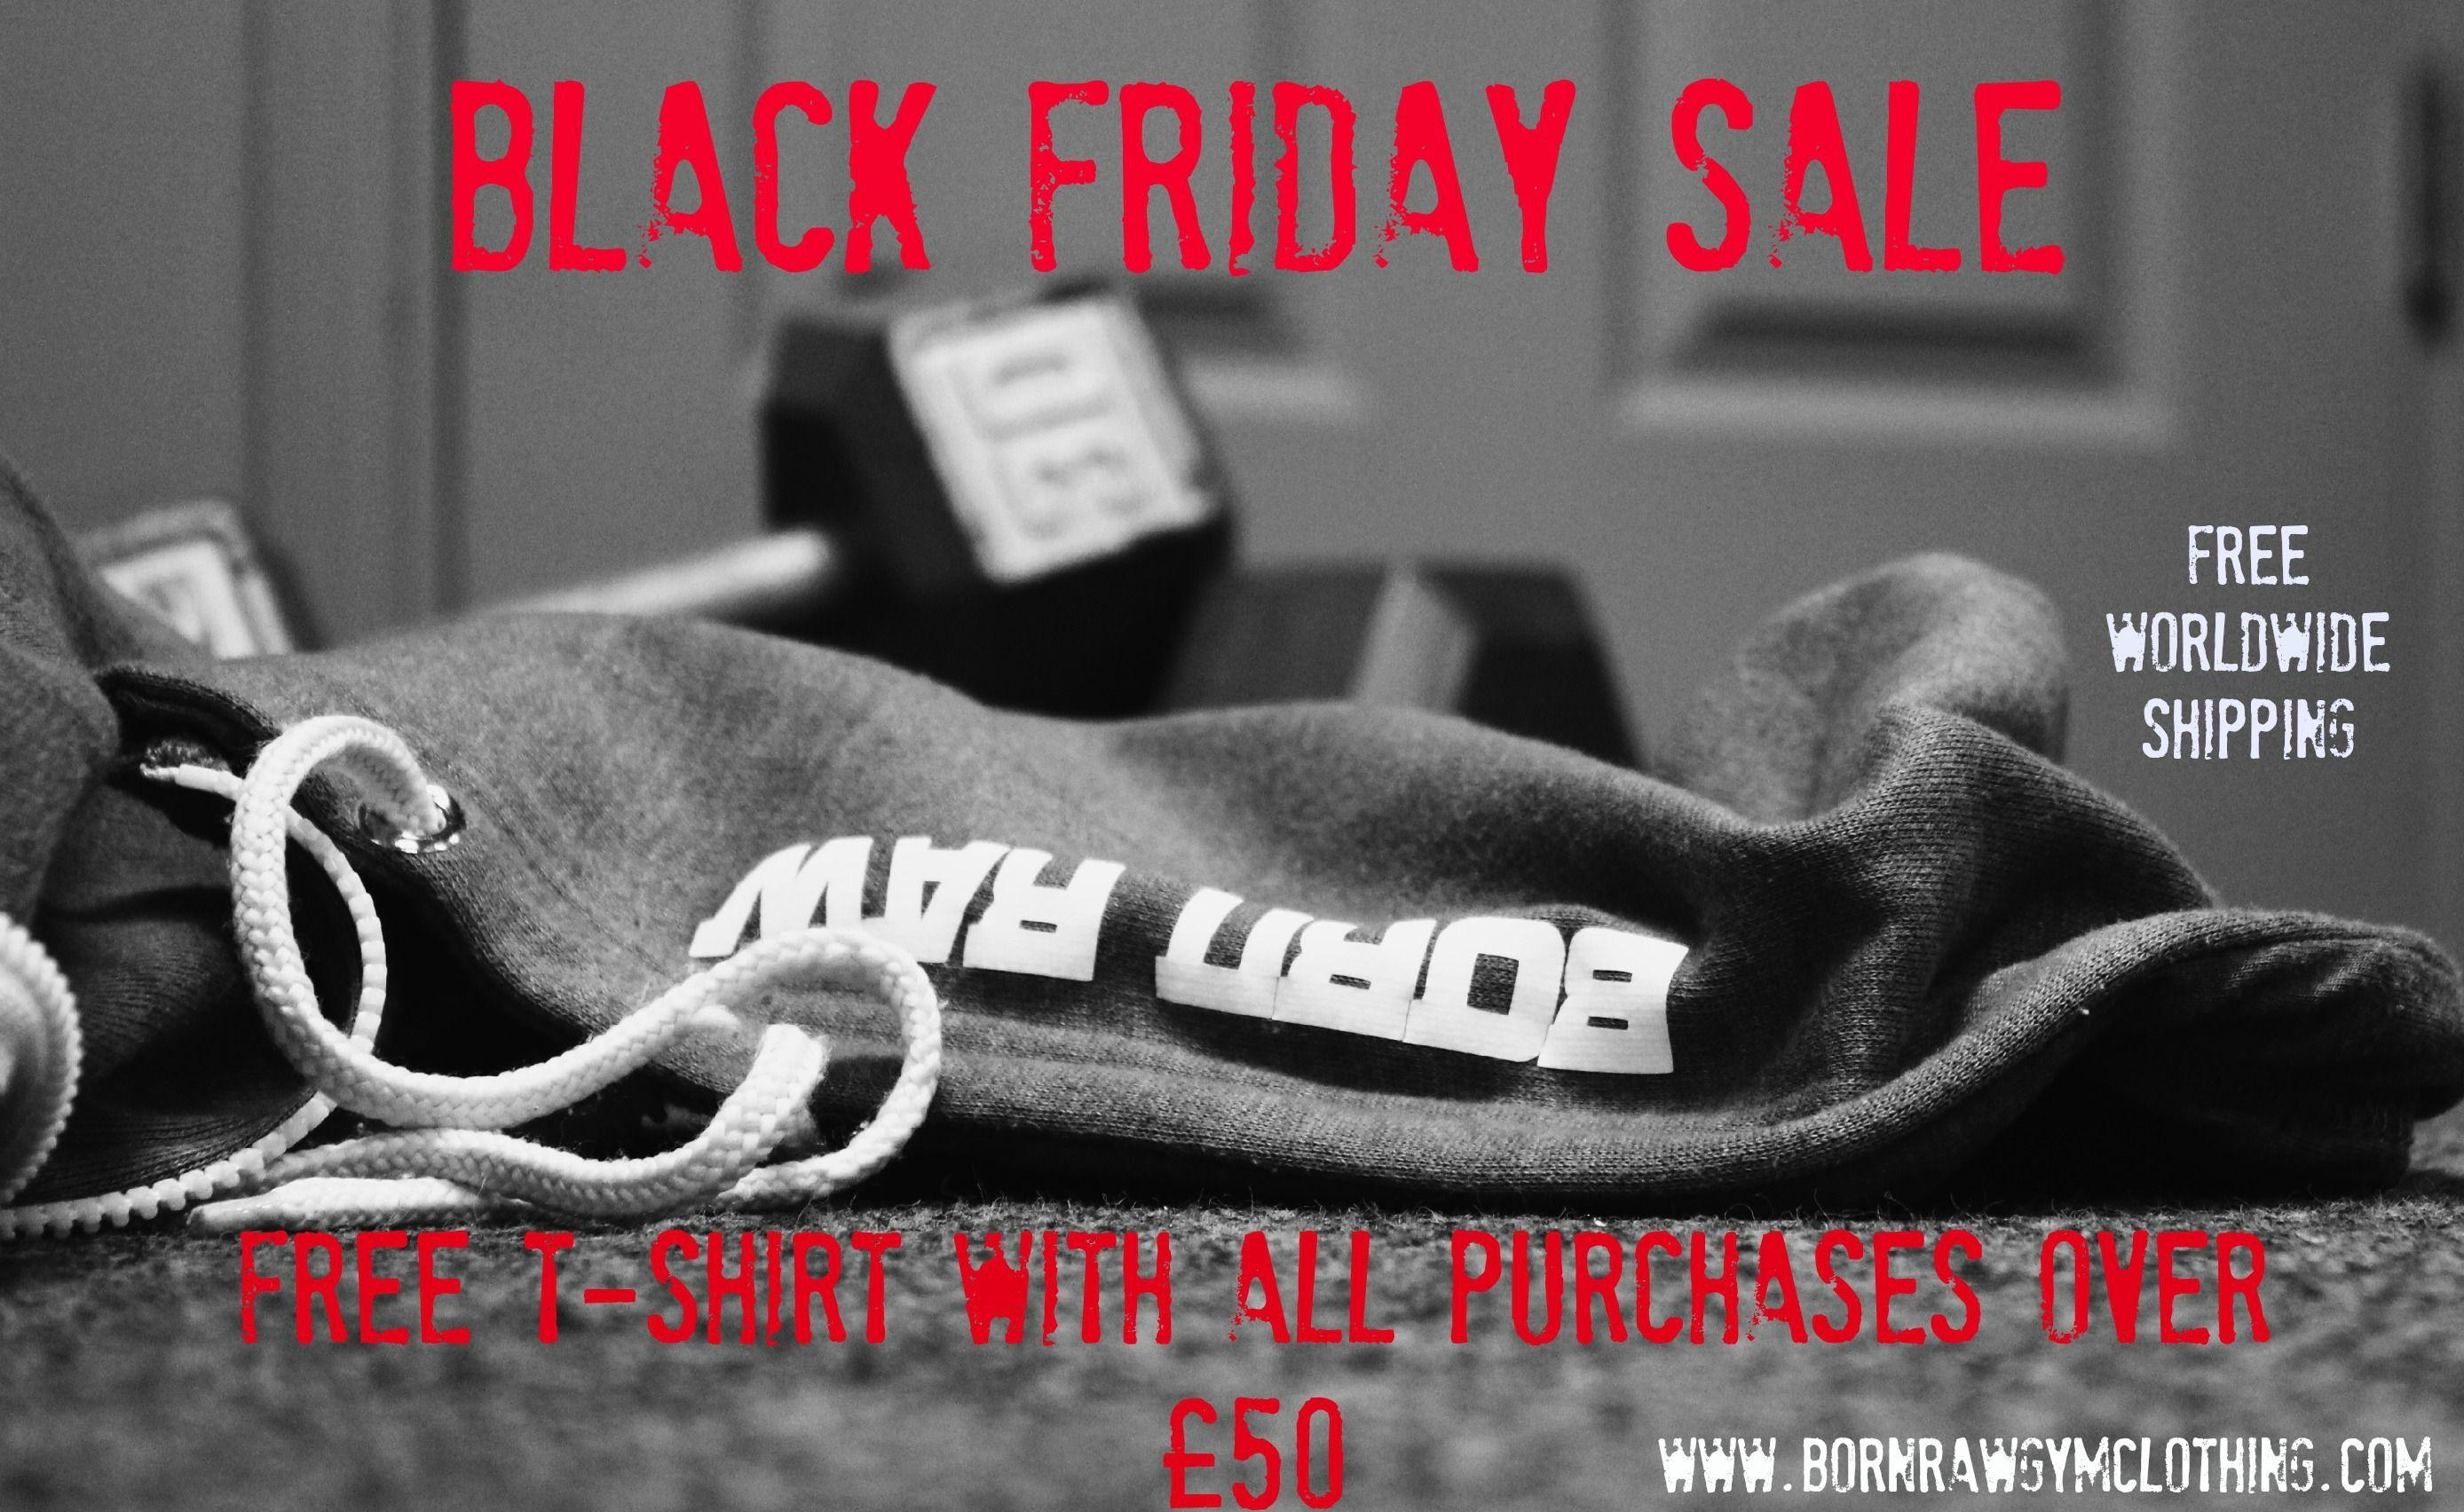 Black Friday sale at Born Raw Gym Clothing